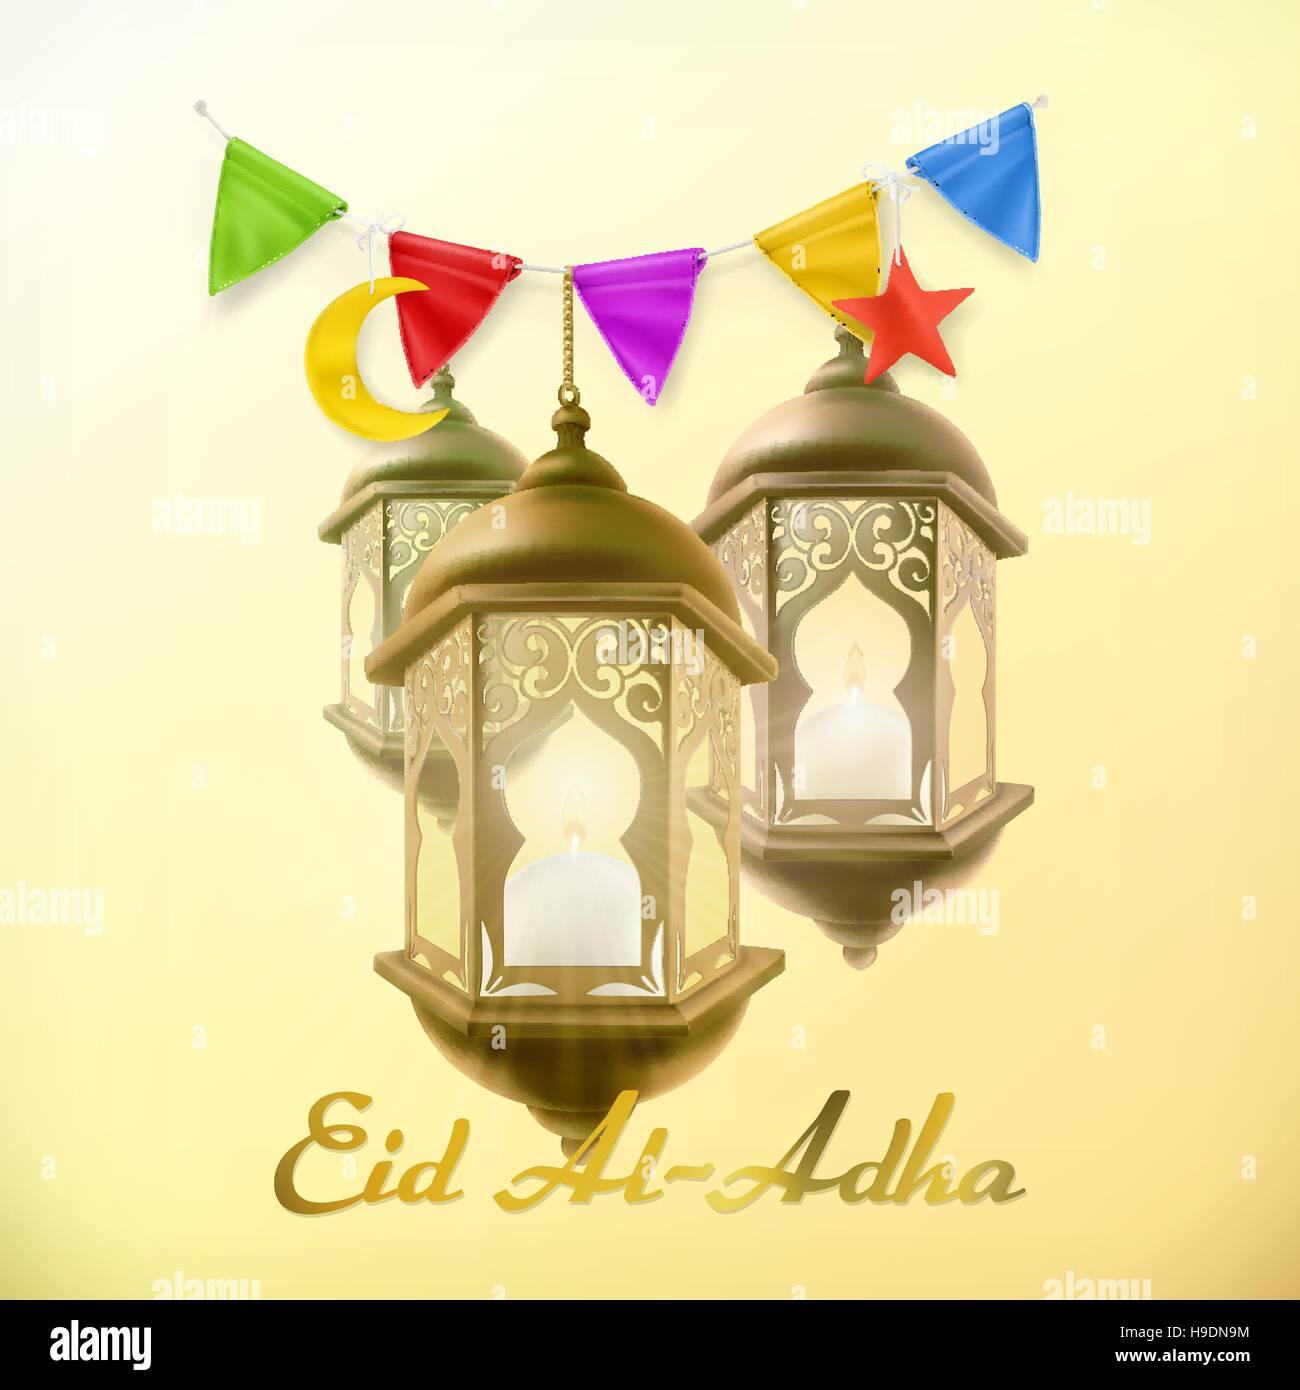 Muslim holiday eid al adha greeting card with lamp islamic muslim holiday eid al adha greeting card with lamp islamic culture vector background kristyandbryce Images